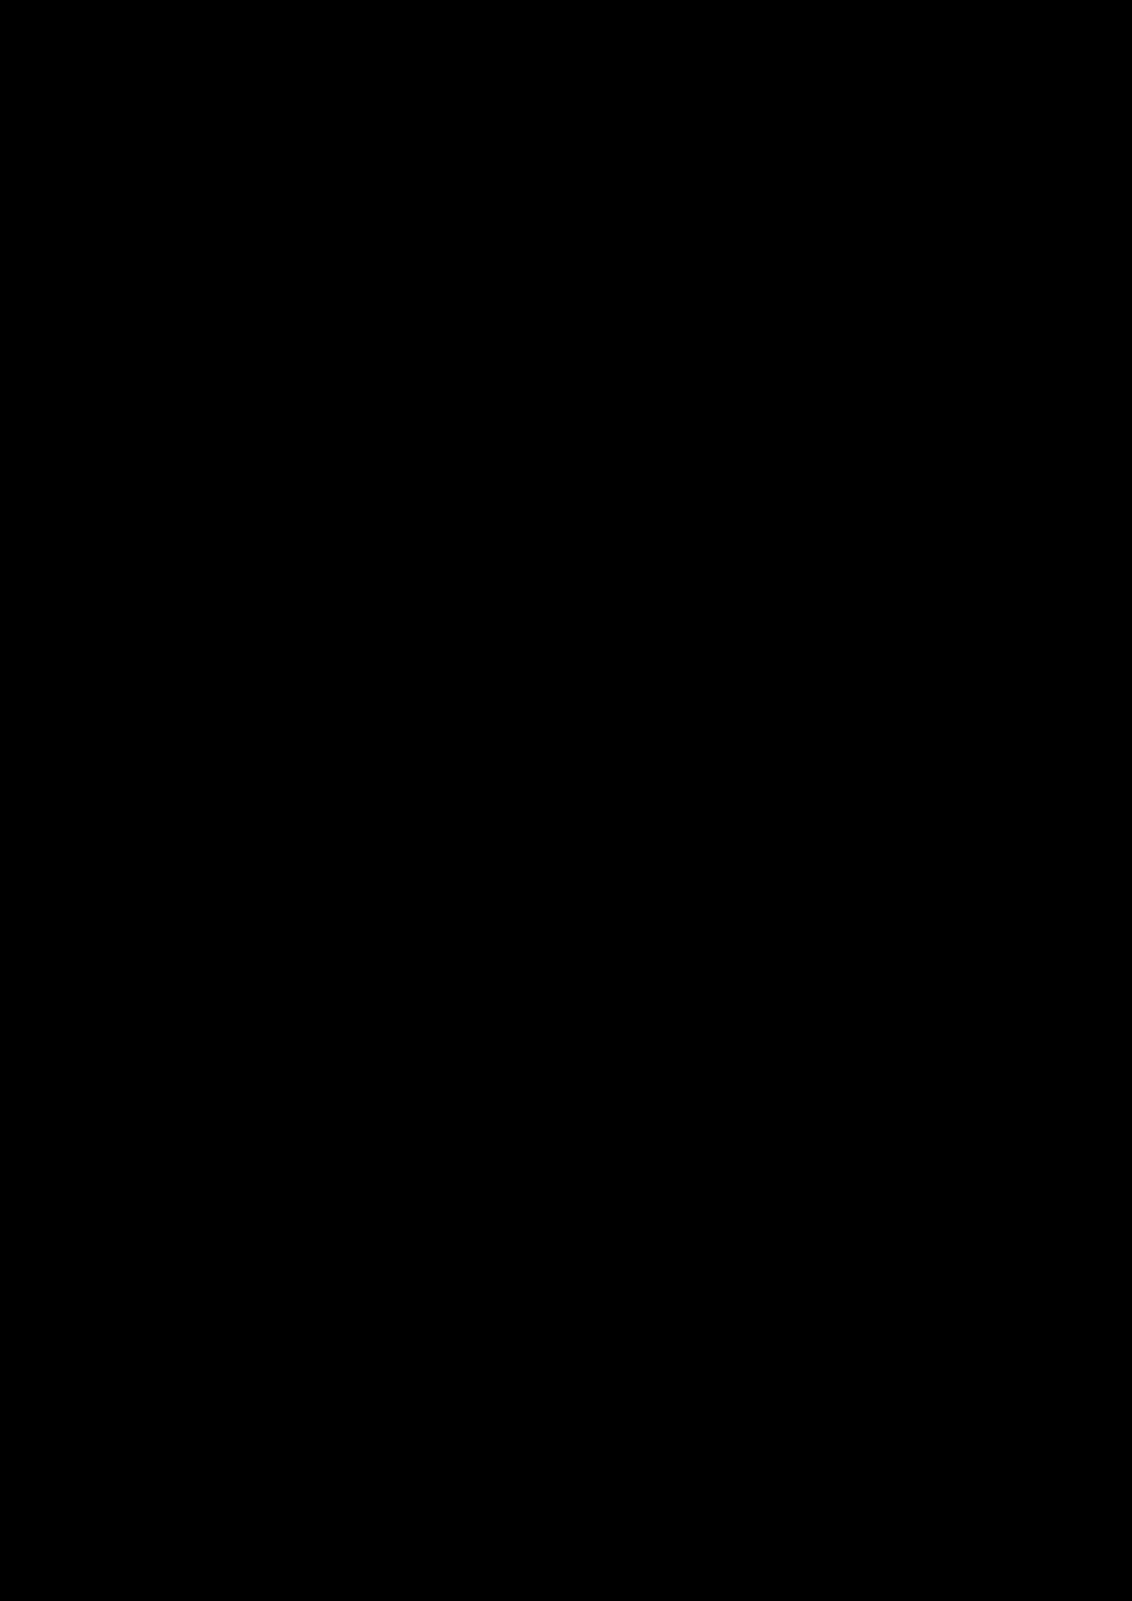 Ten lyubvi slide, Image 31